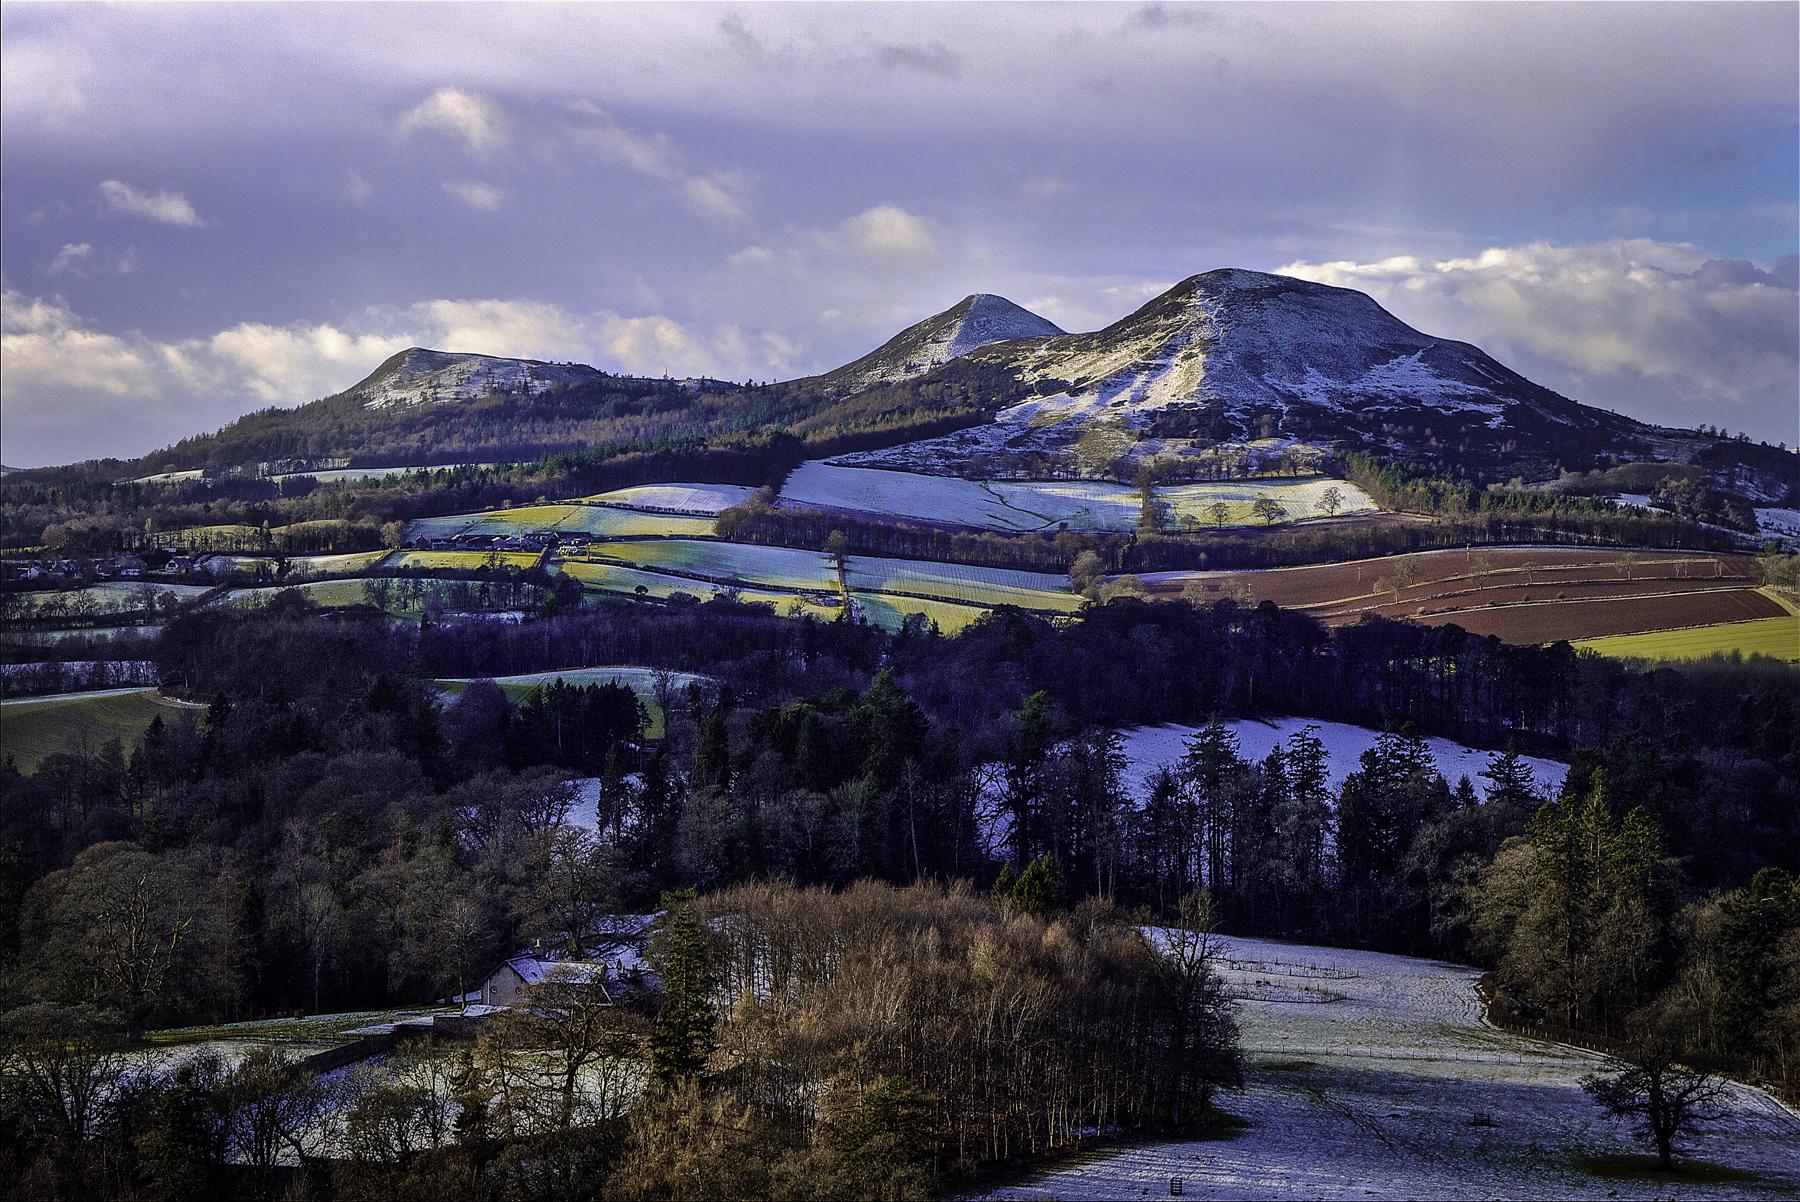 Scott's view, Eildons, Melrose